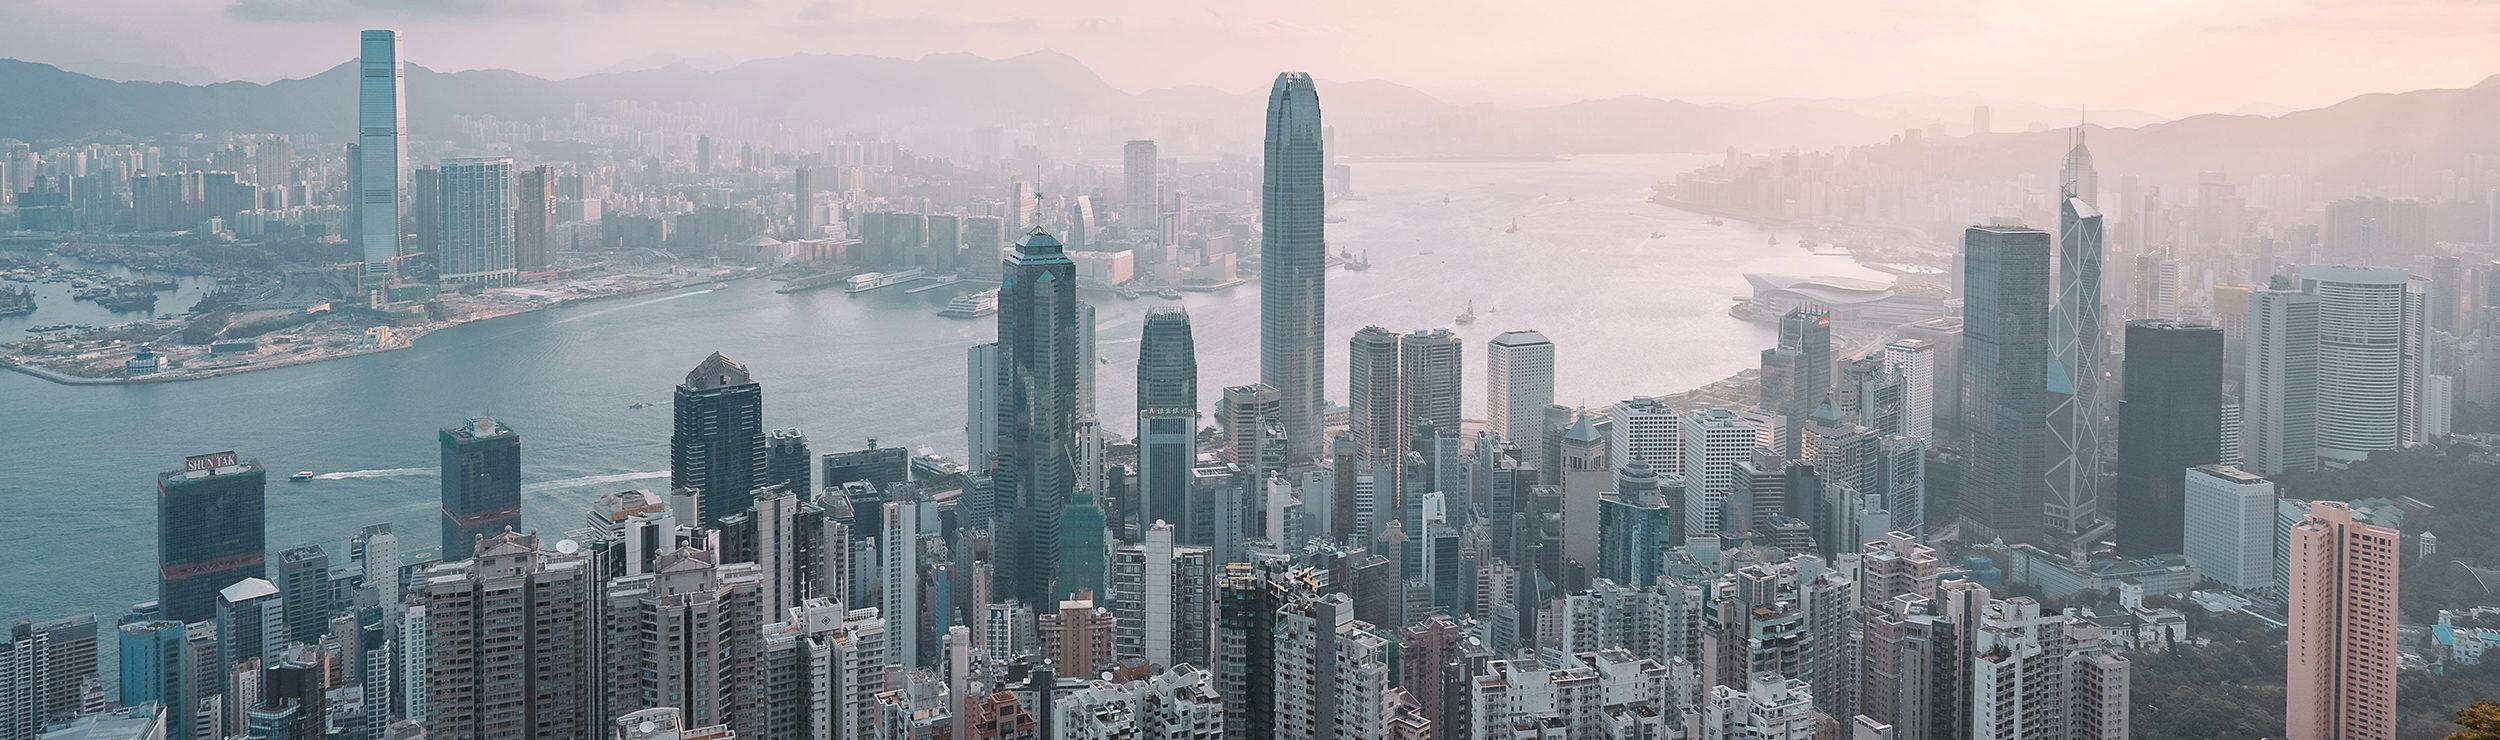 City skyline in darker color tones